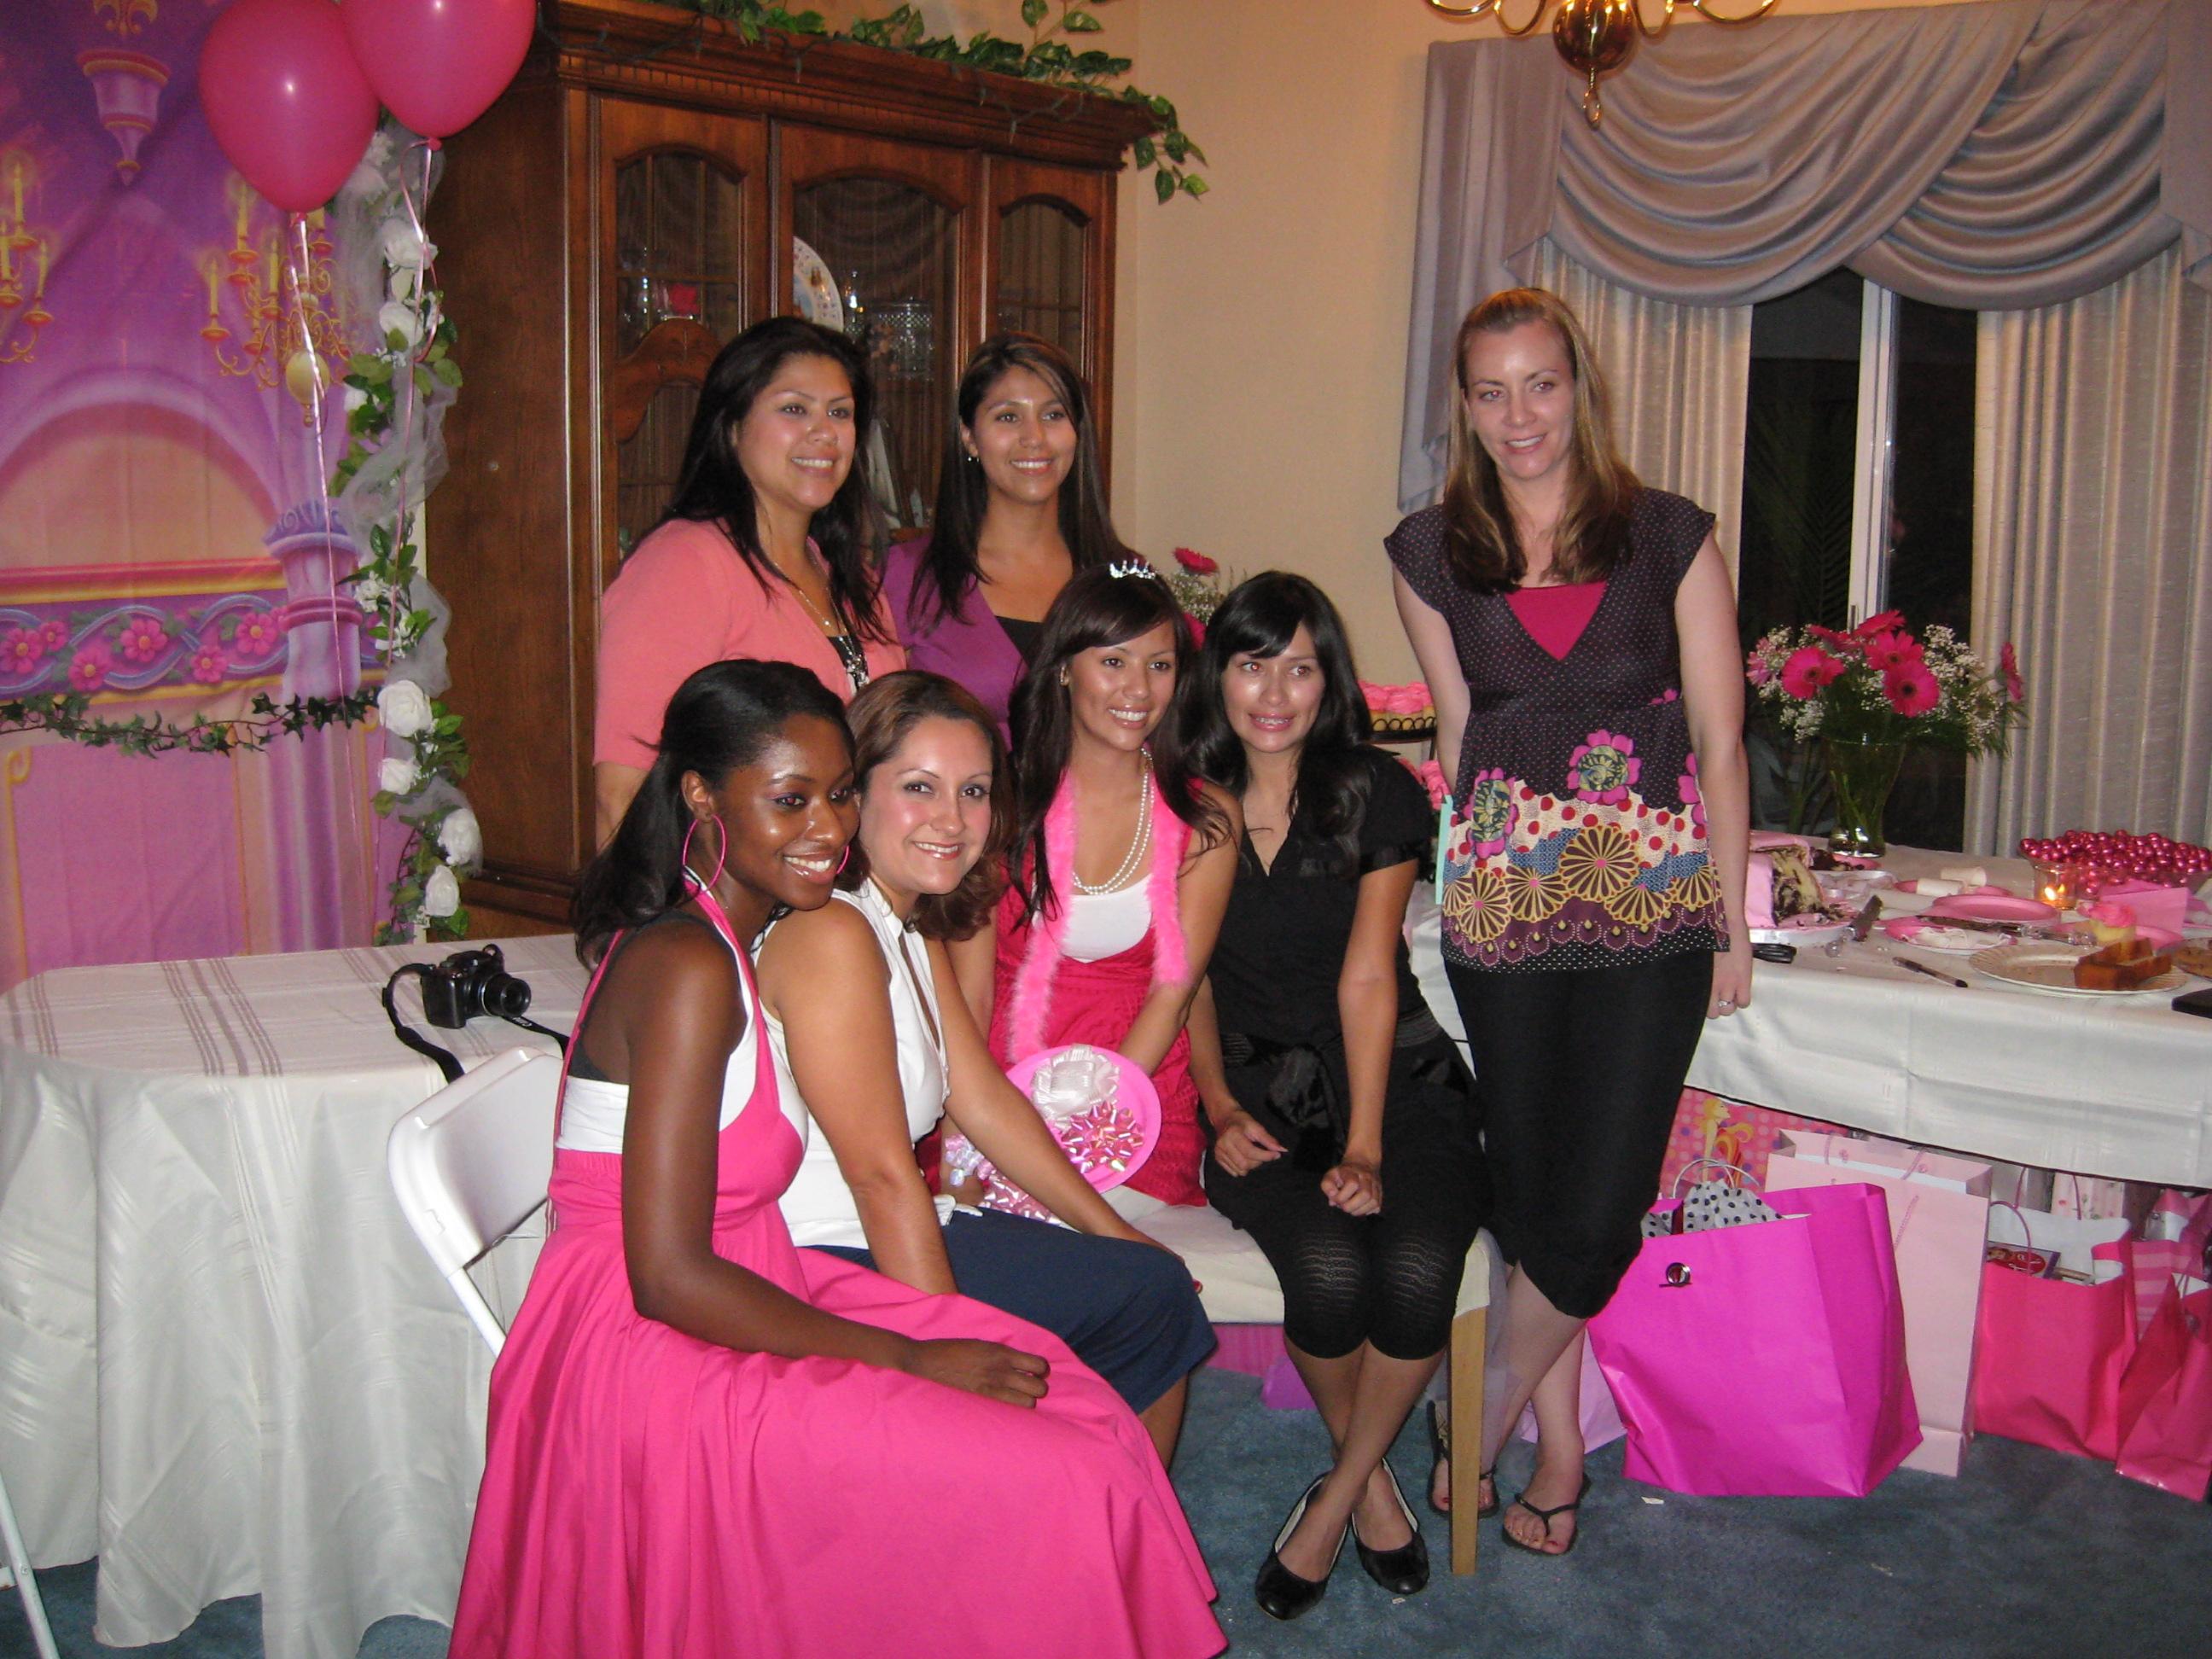 Free Images : Meal, Pink, Bride, Groom, Marriage, Cake